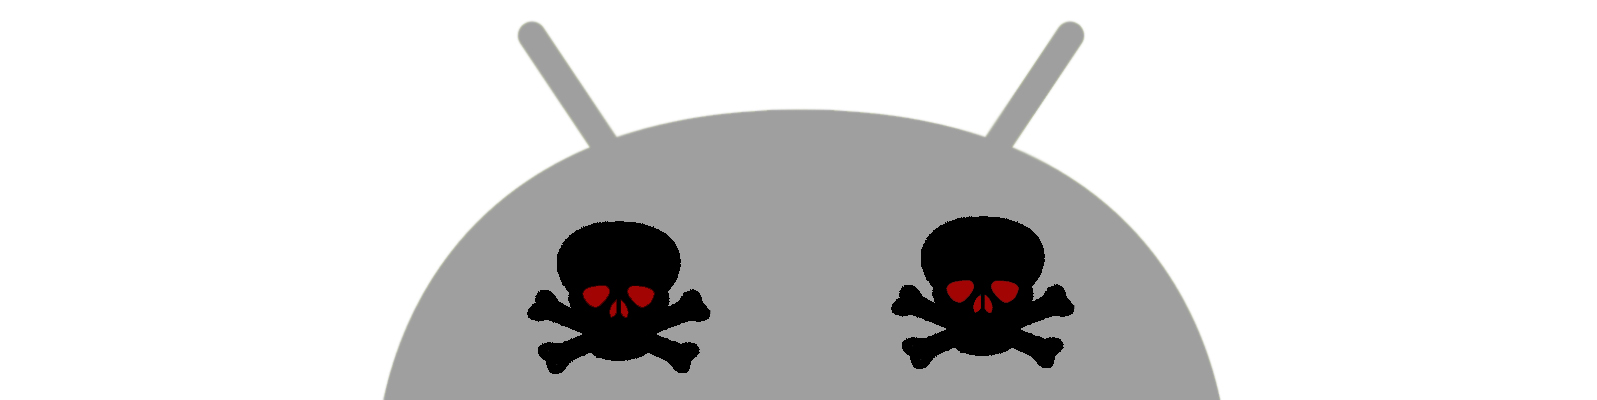 androidmeta